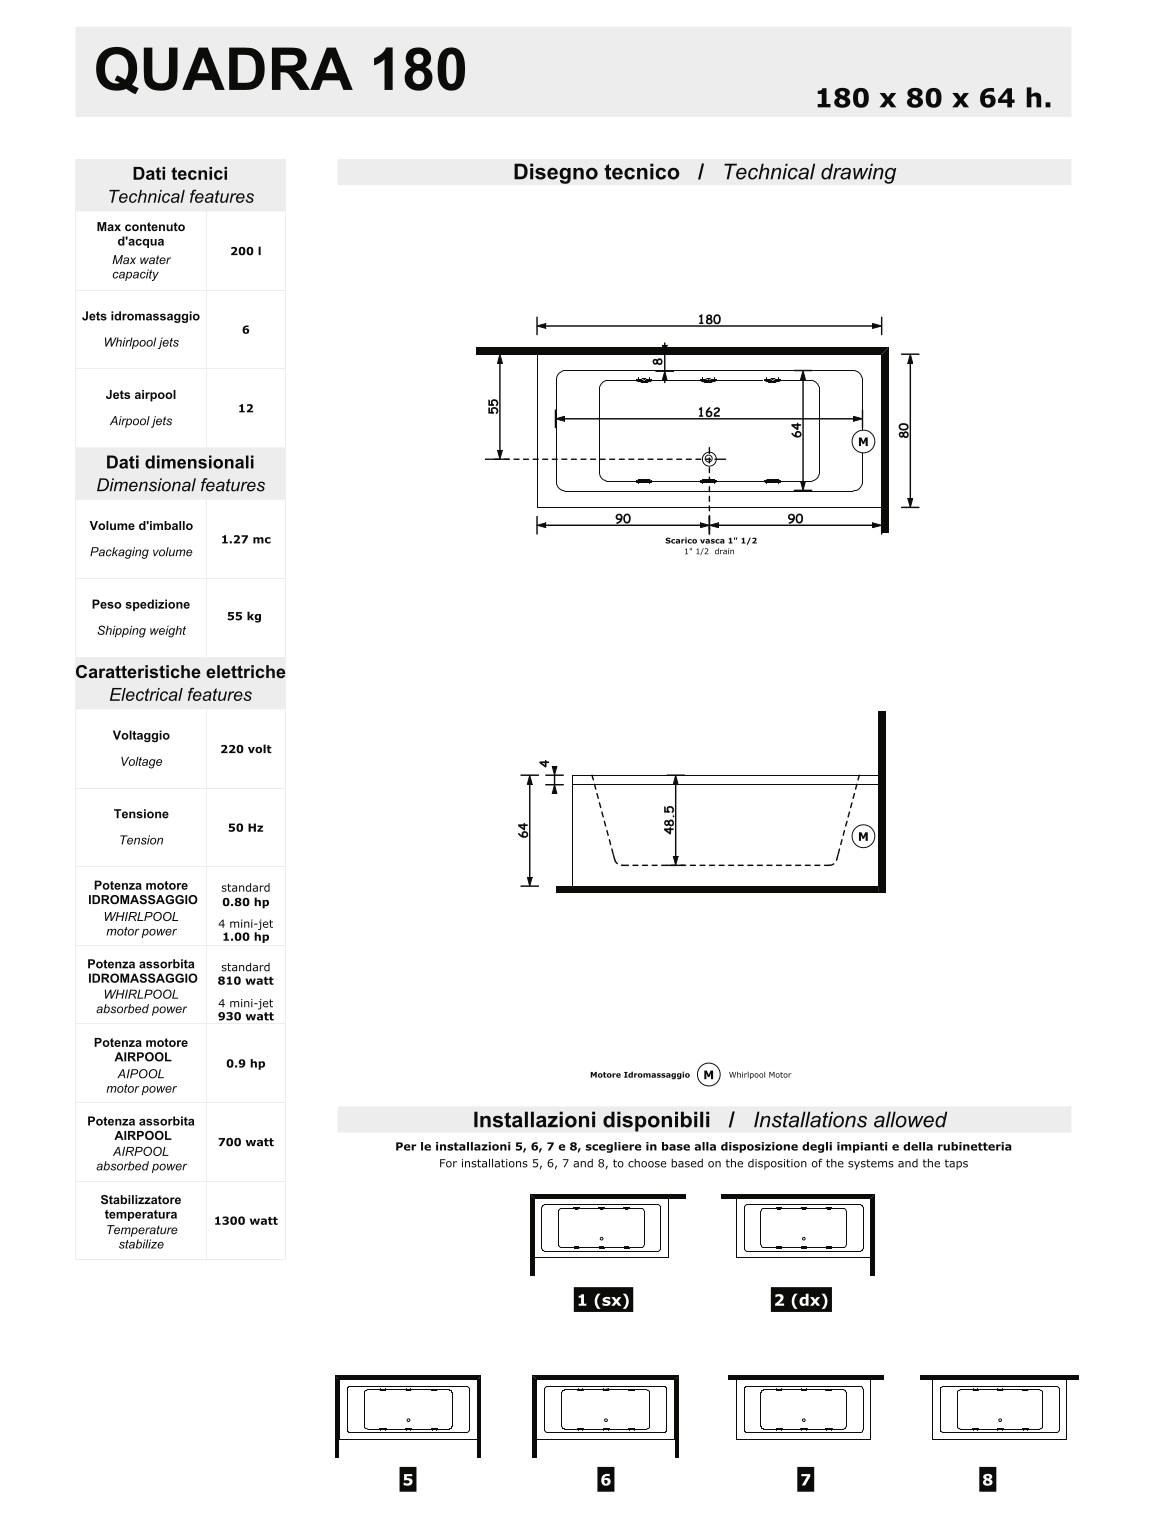 data sheet bathtub quadra 180